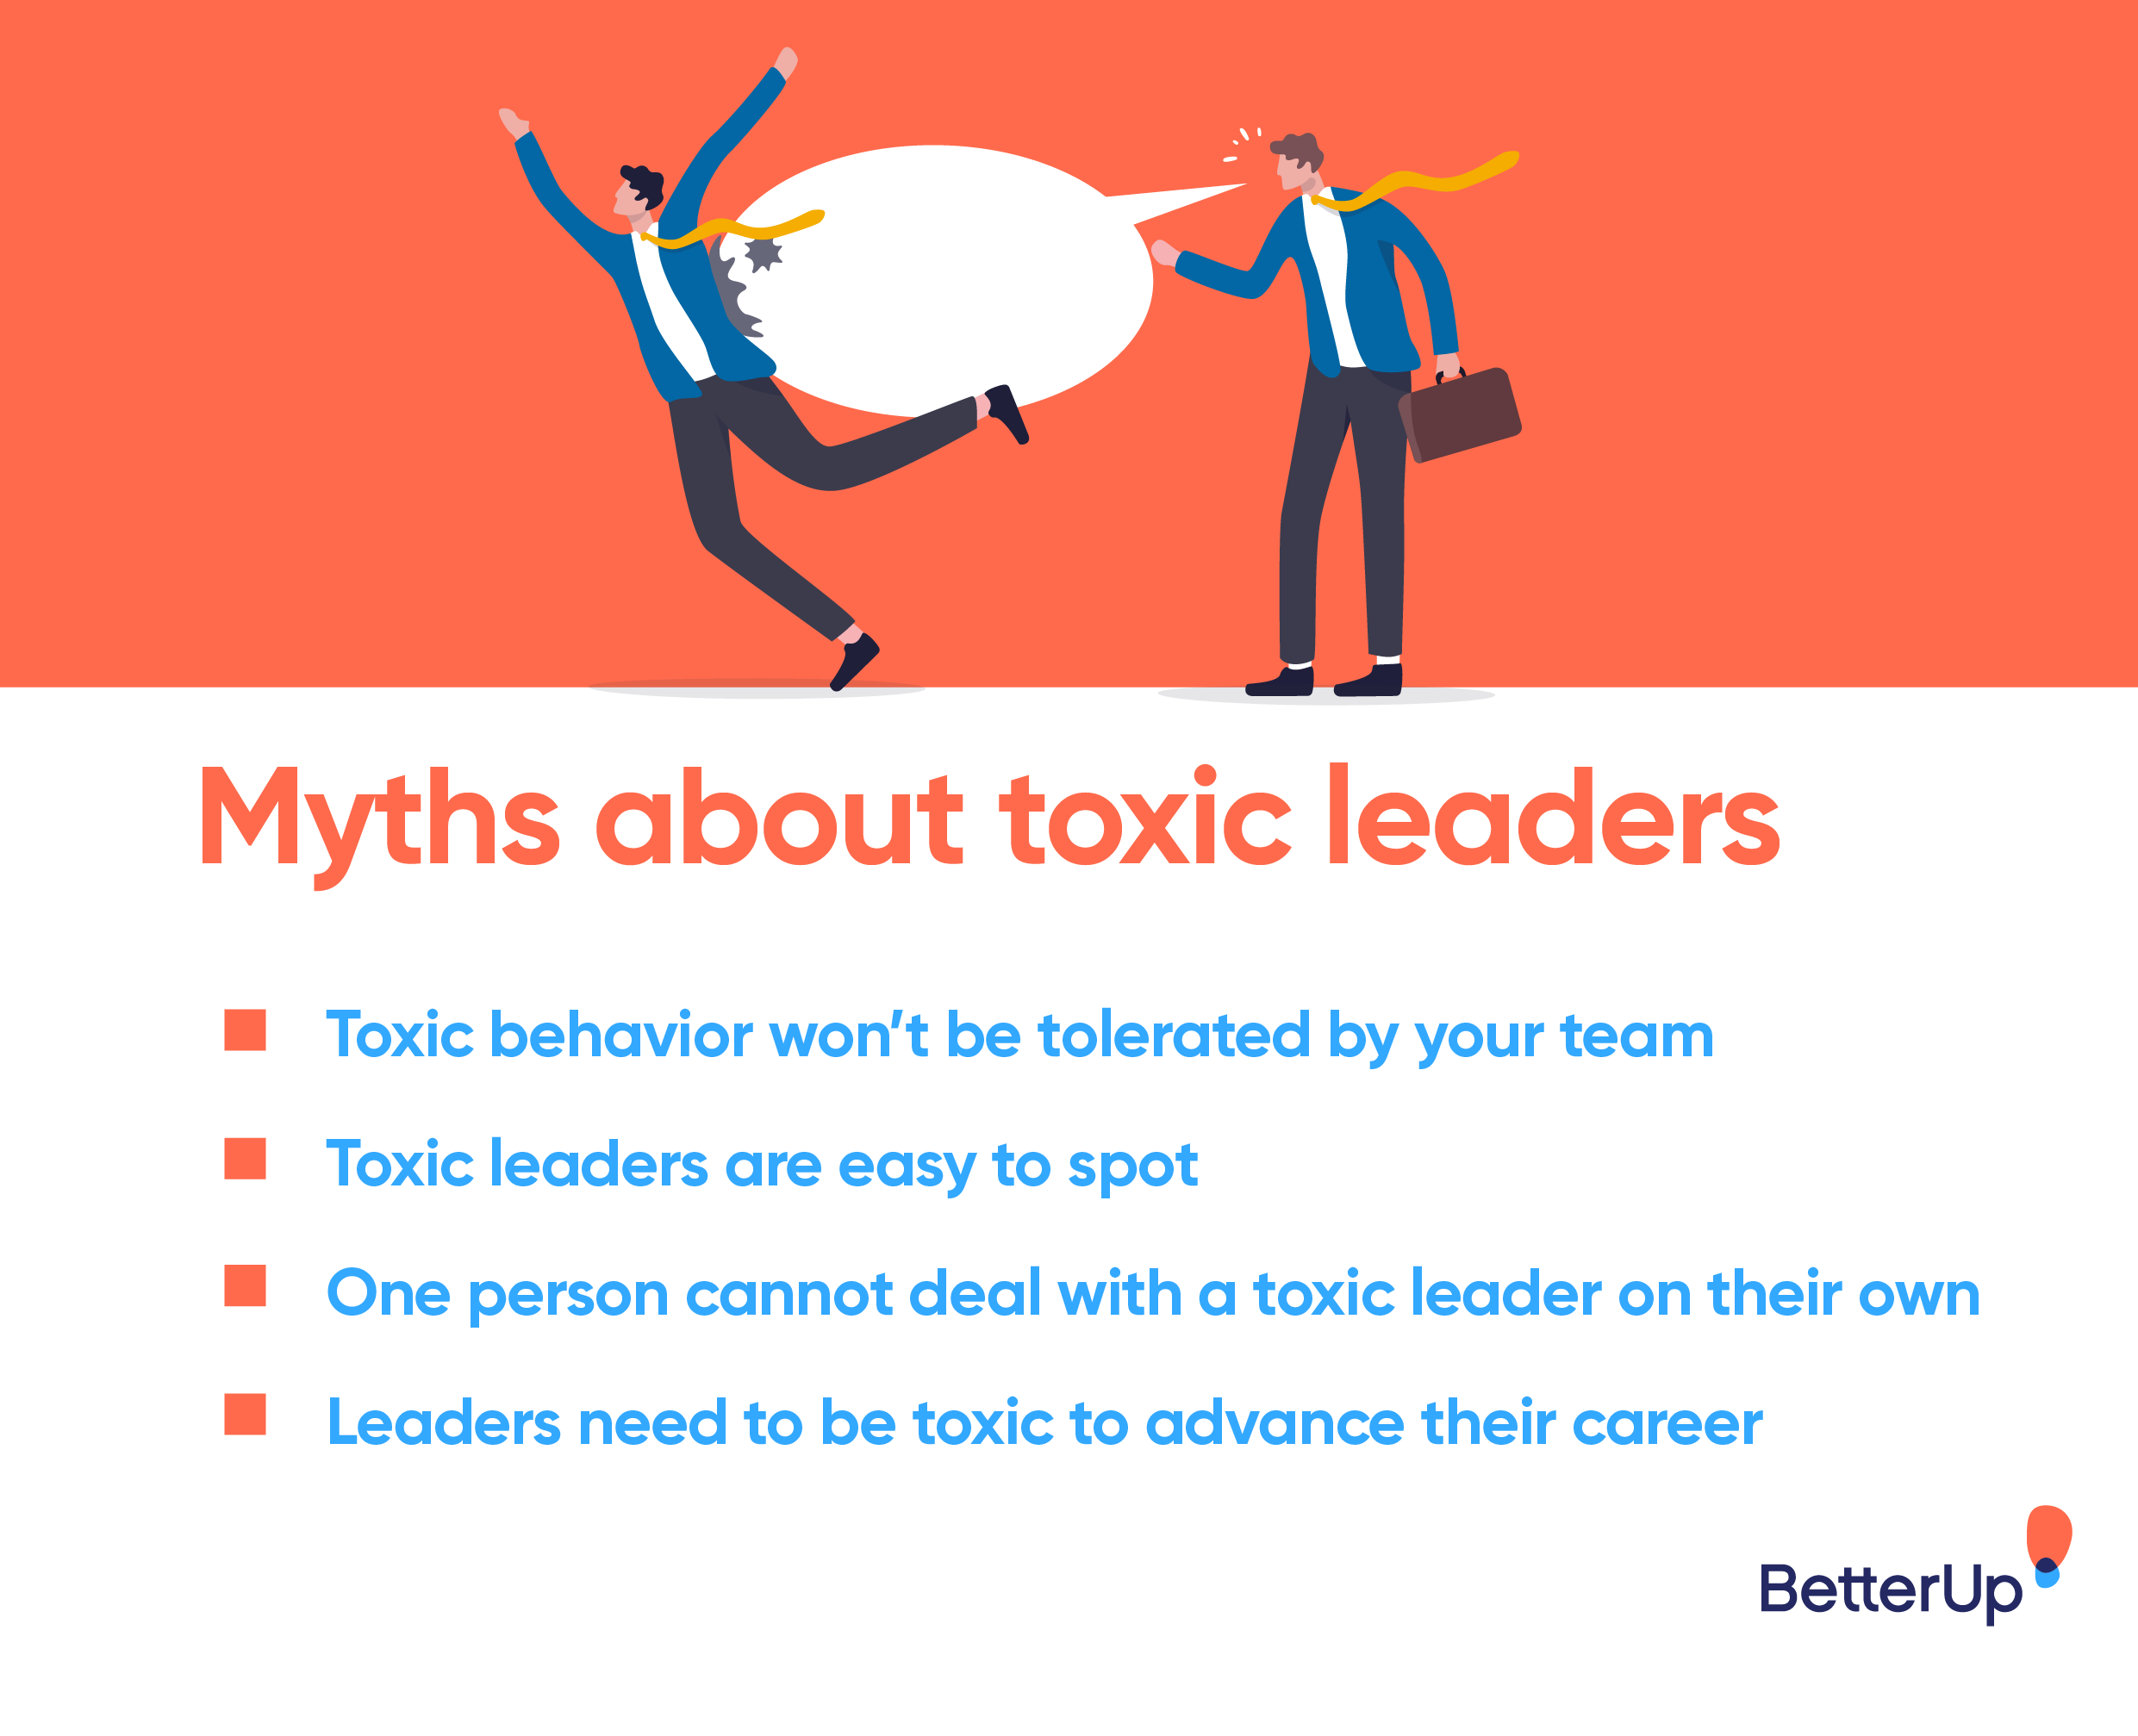 toxic-leaders-myths-toxic-leadership